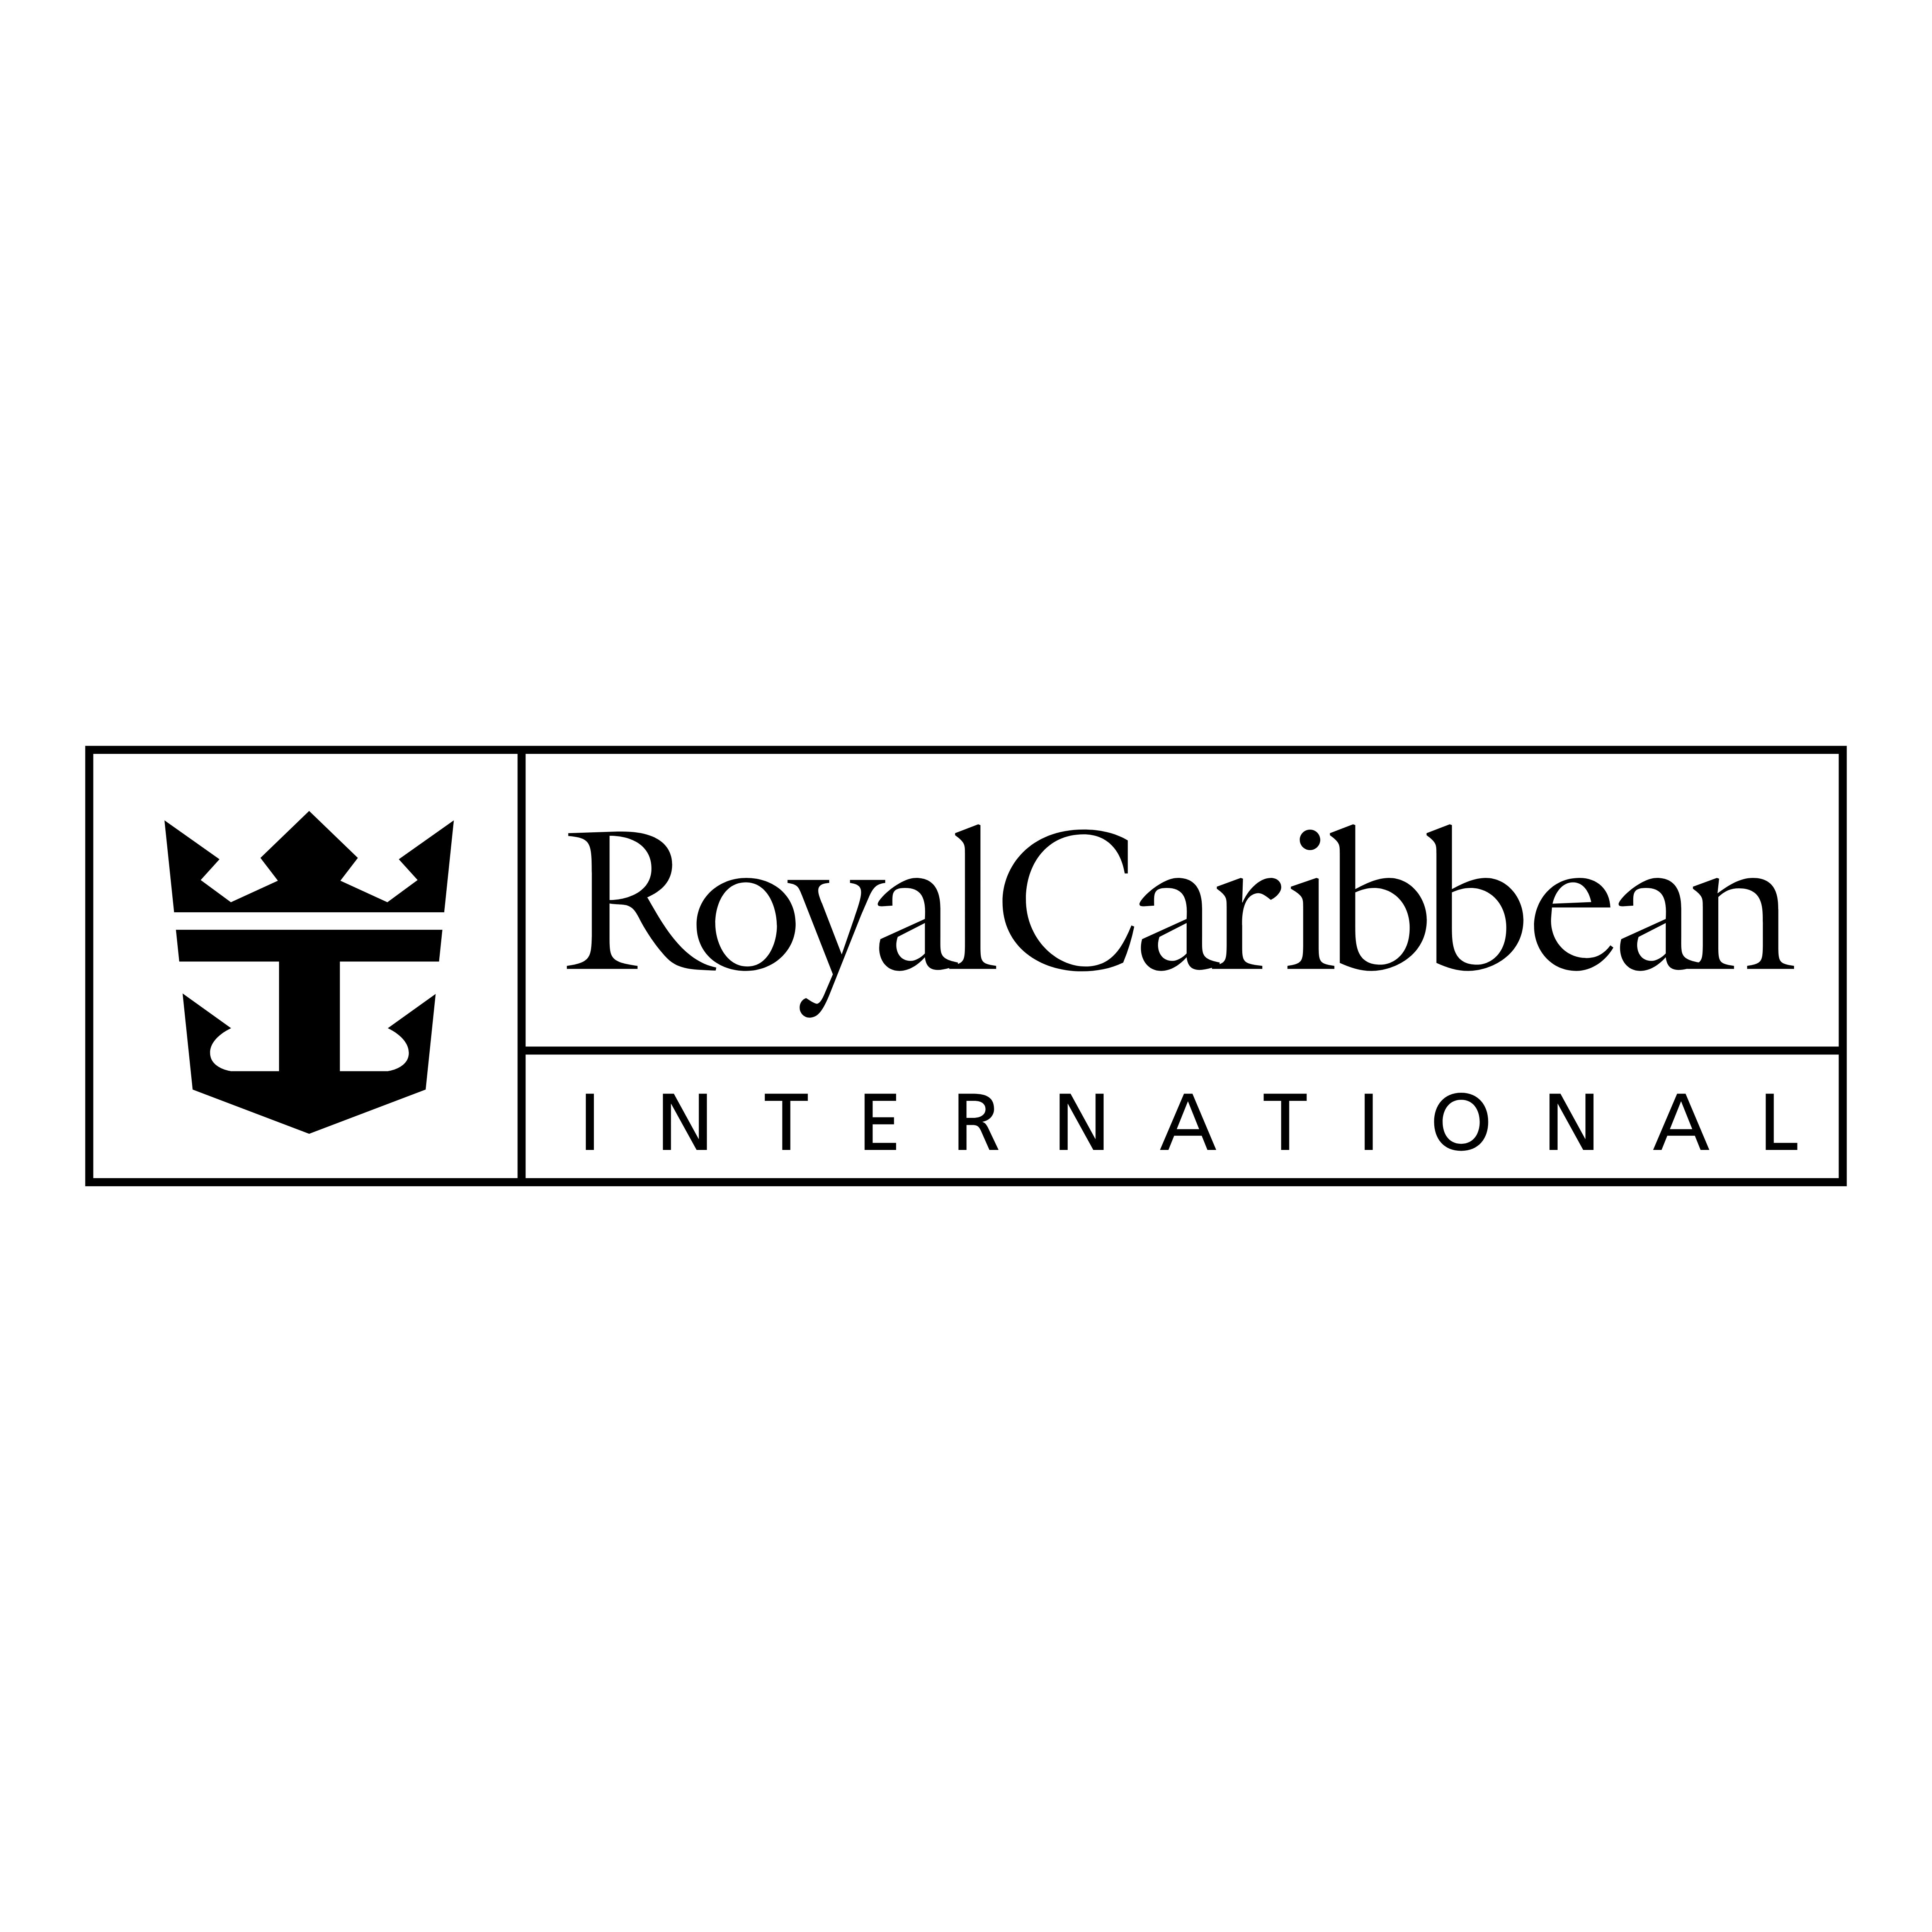 royal caribbean international � logos download